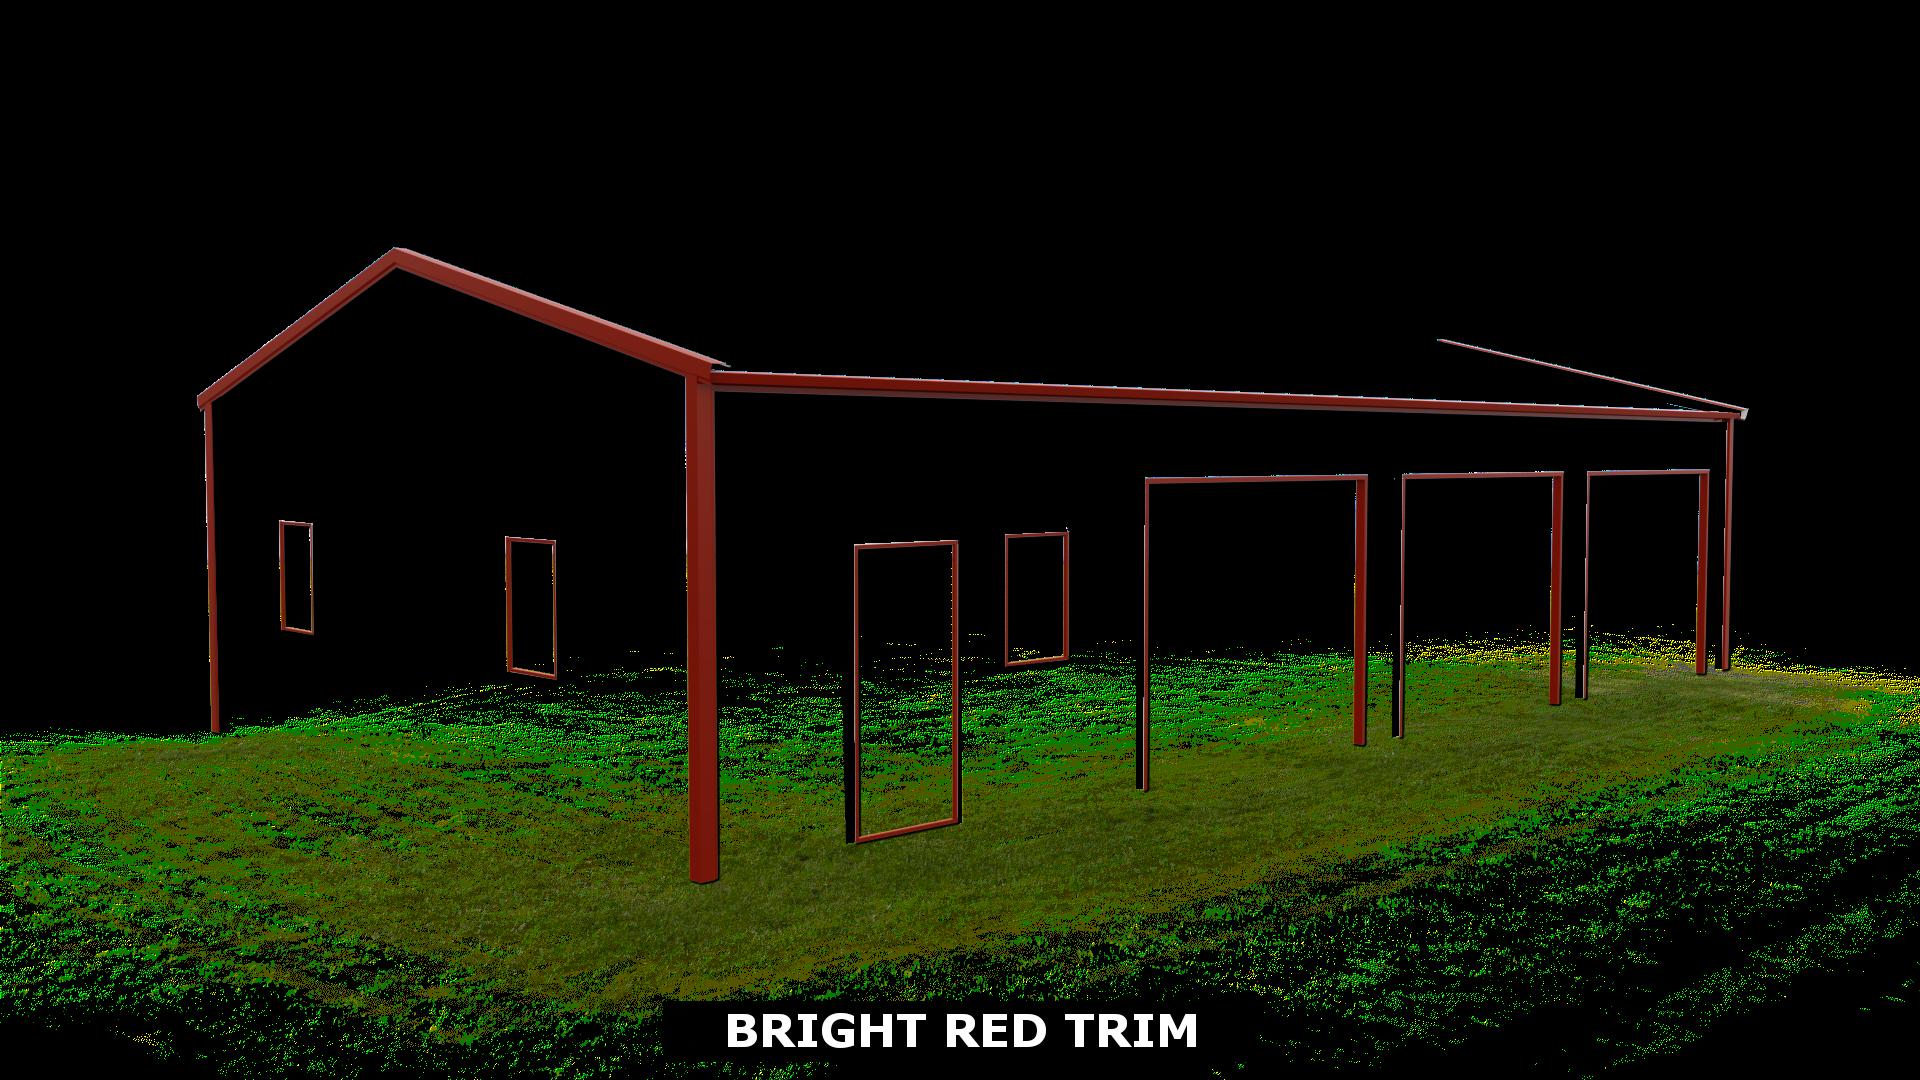 BRIGHT RED TRIM